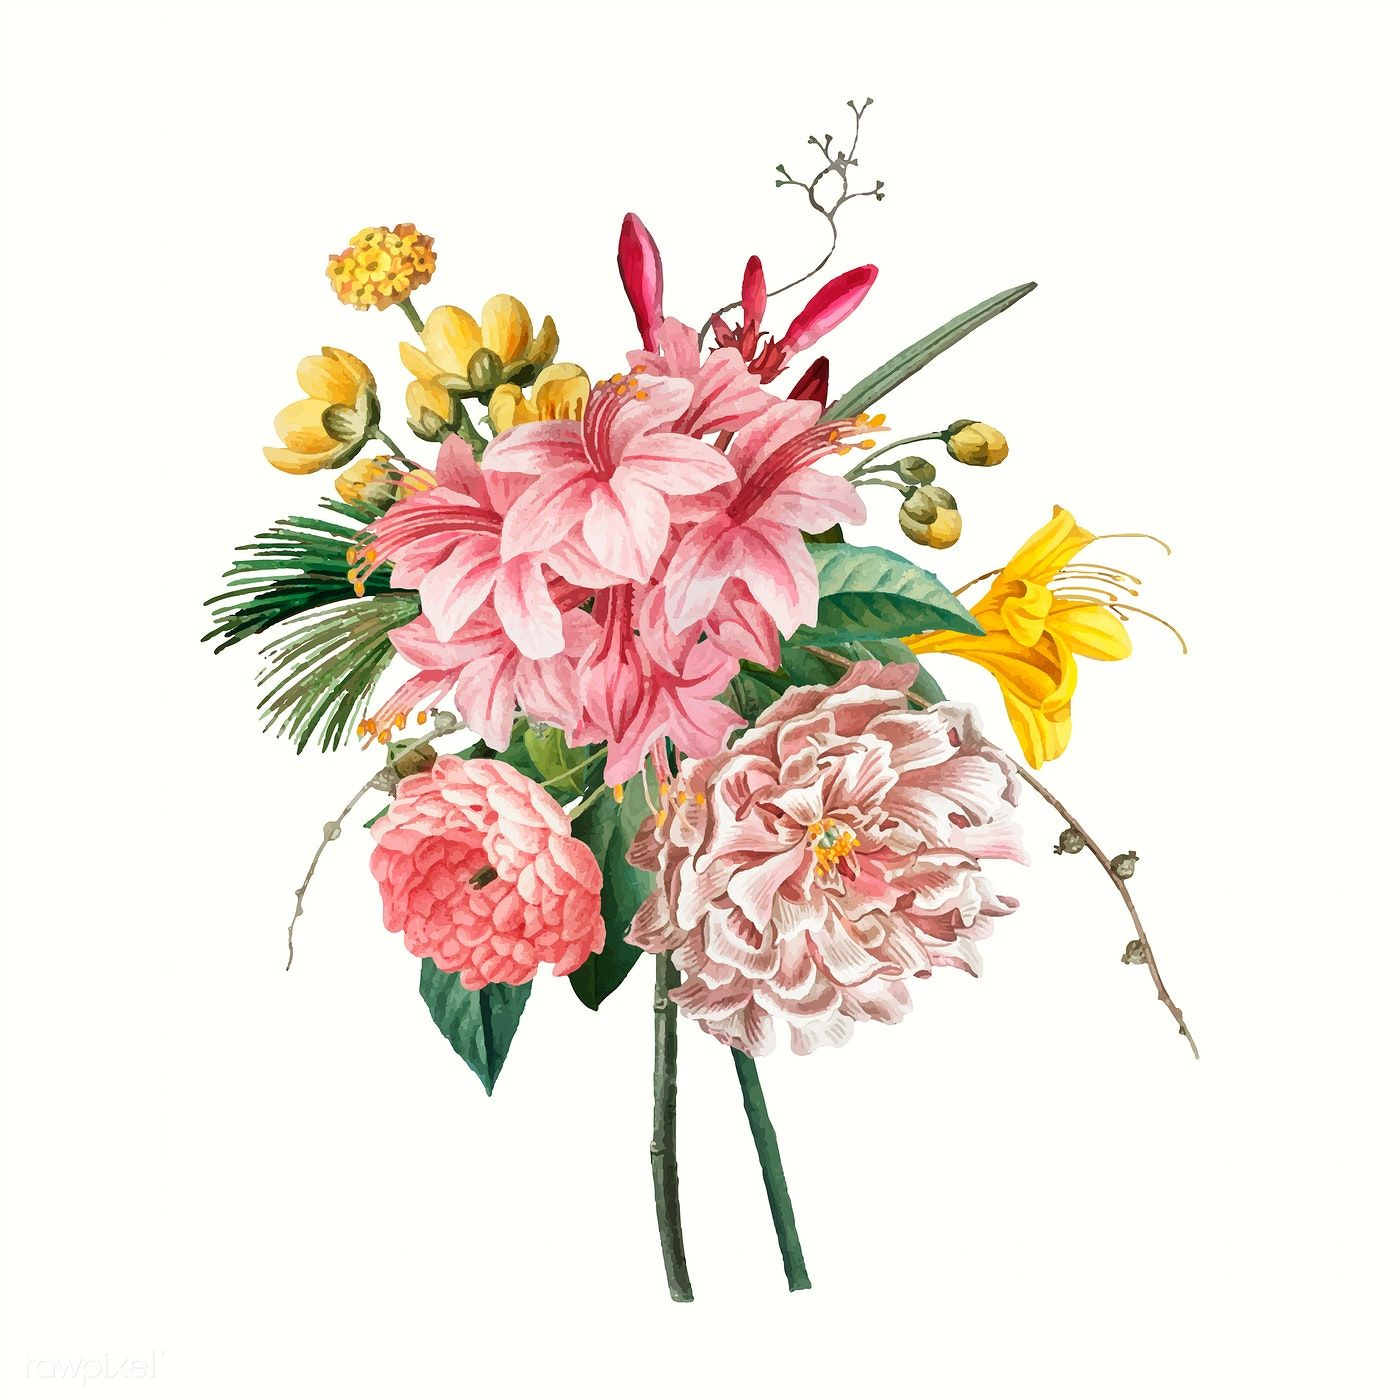 Colorful Blooming Vintage Flowers Vector Free Image By Rawpixel Com Vector Flowers Vintage Flowers Flower Illustration